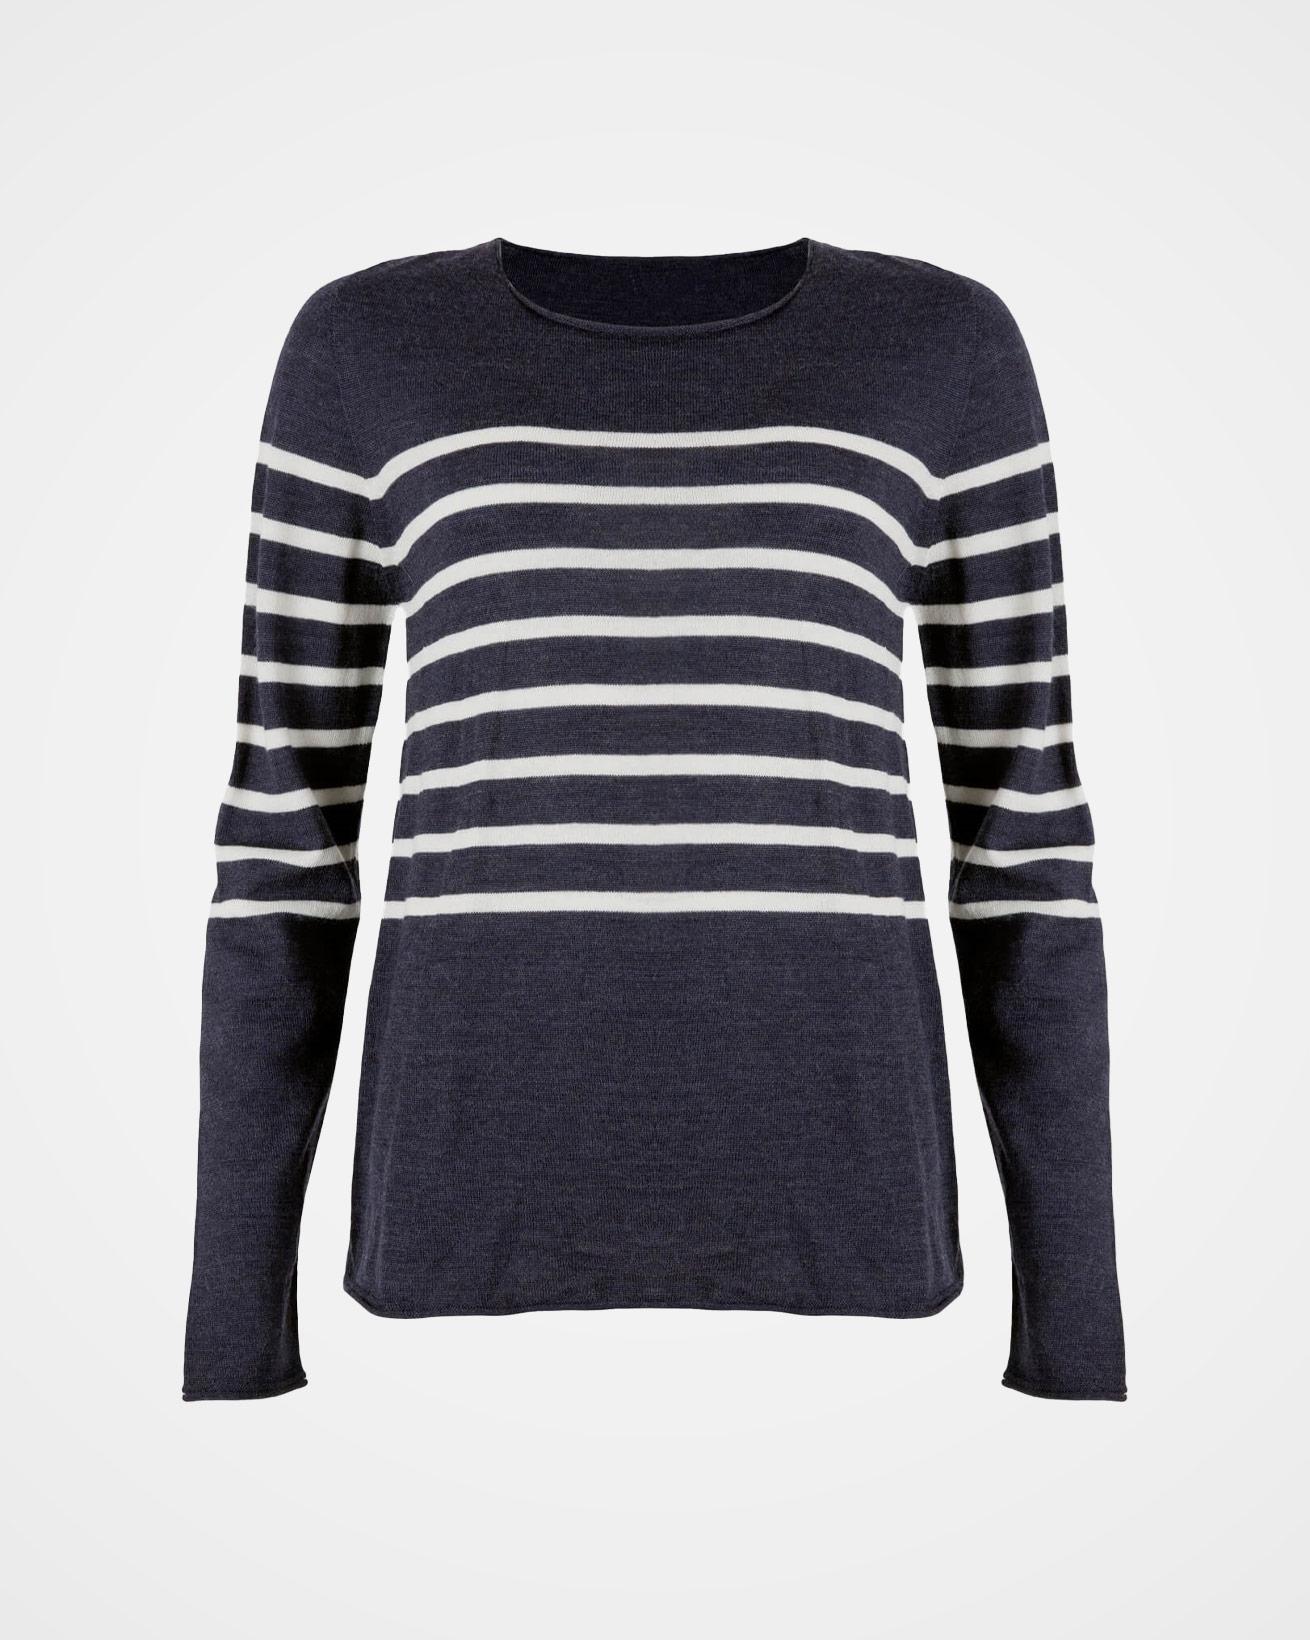 7036_fine-knit-merino-crew-neck_navy-ecru-stripe_front.jpg